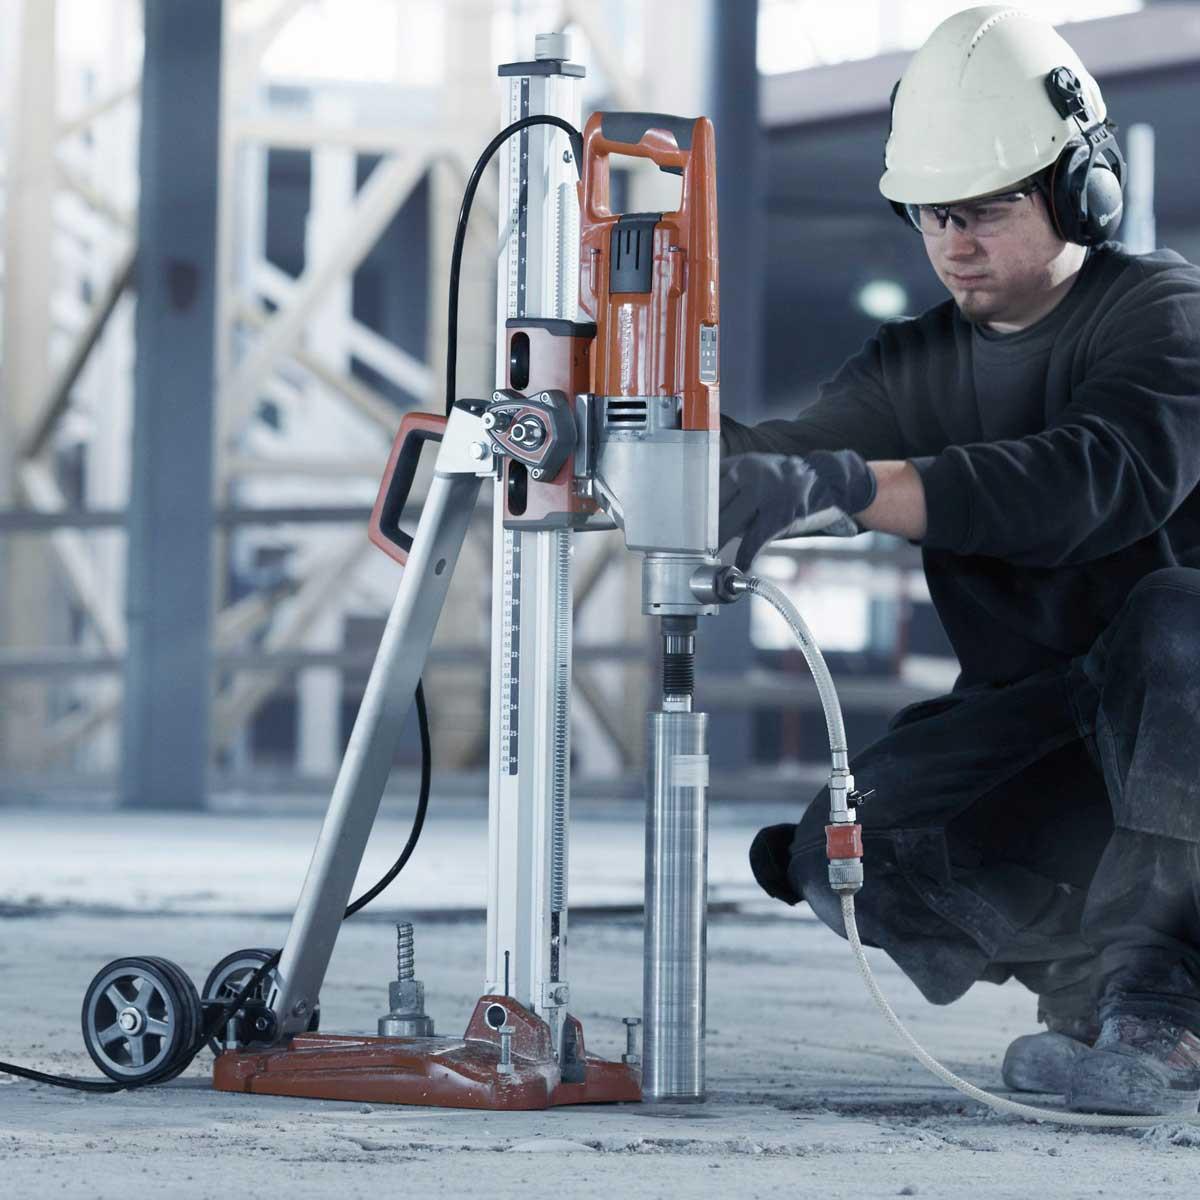 Husqvarna DS250 stand floor drill